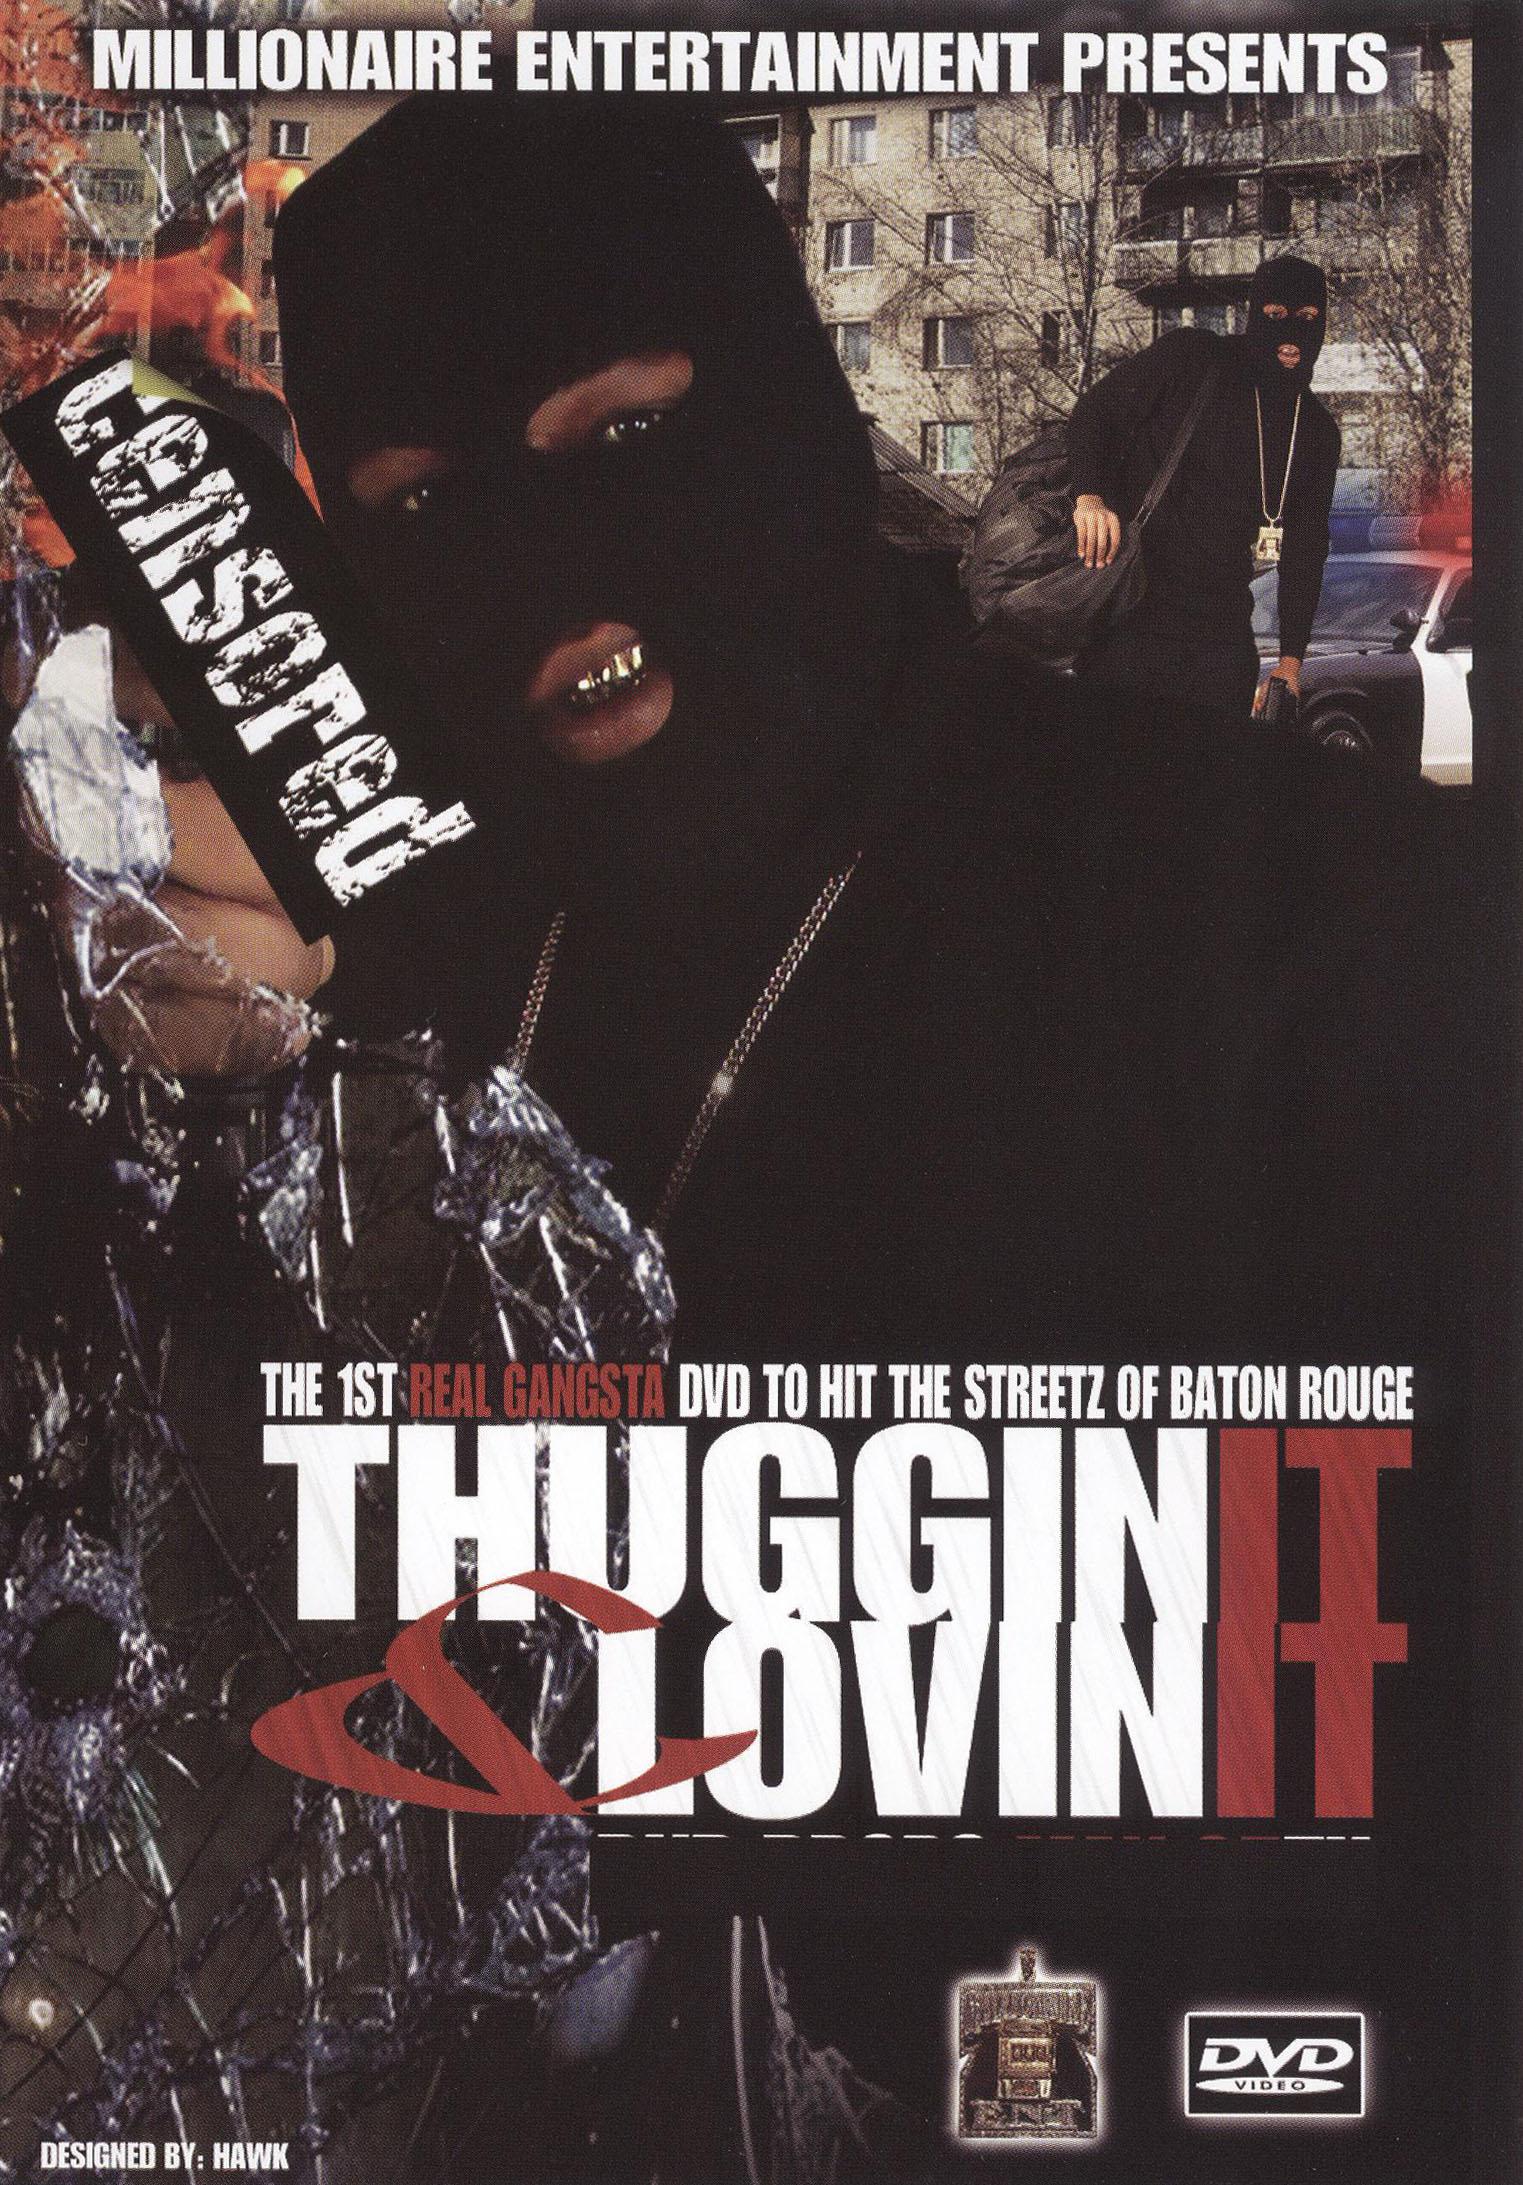 Thuggin' It and Lovin' It